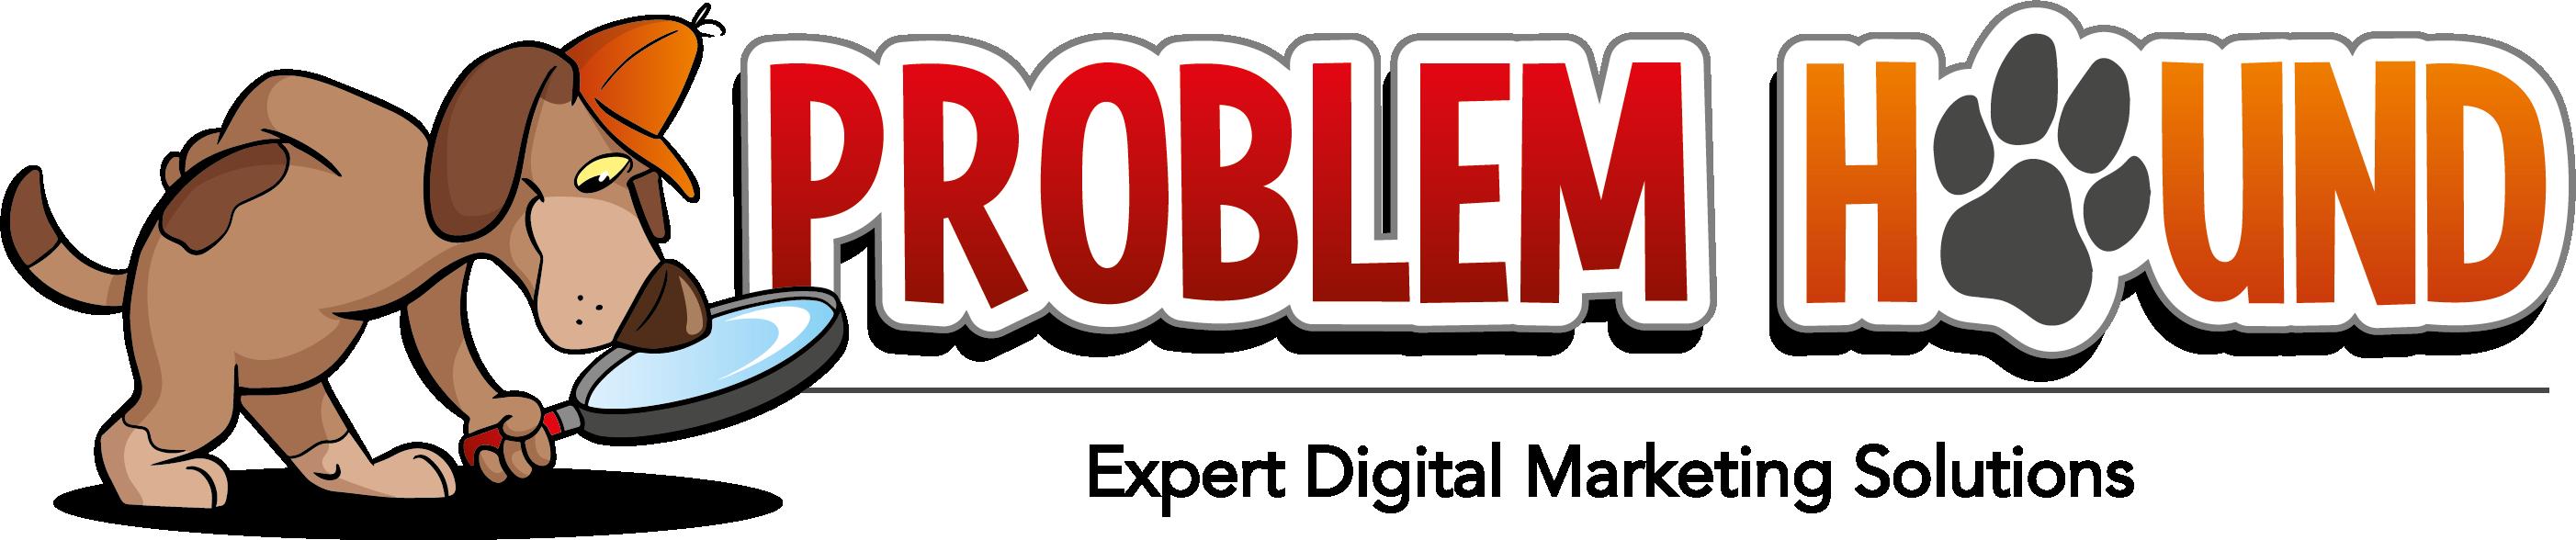 Cartoon Logo for Digital Marketing Brand Needed